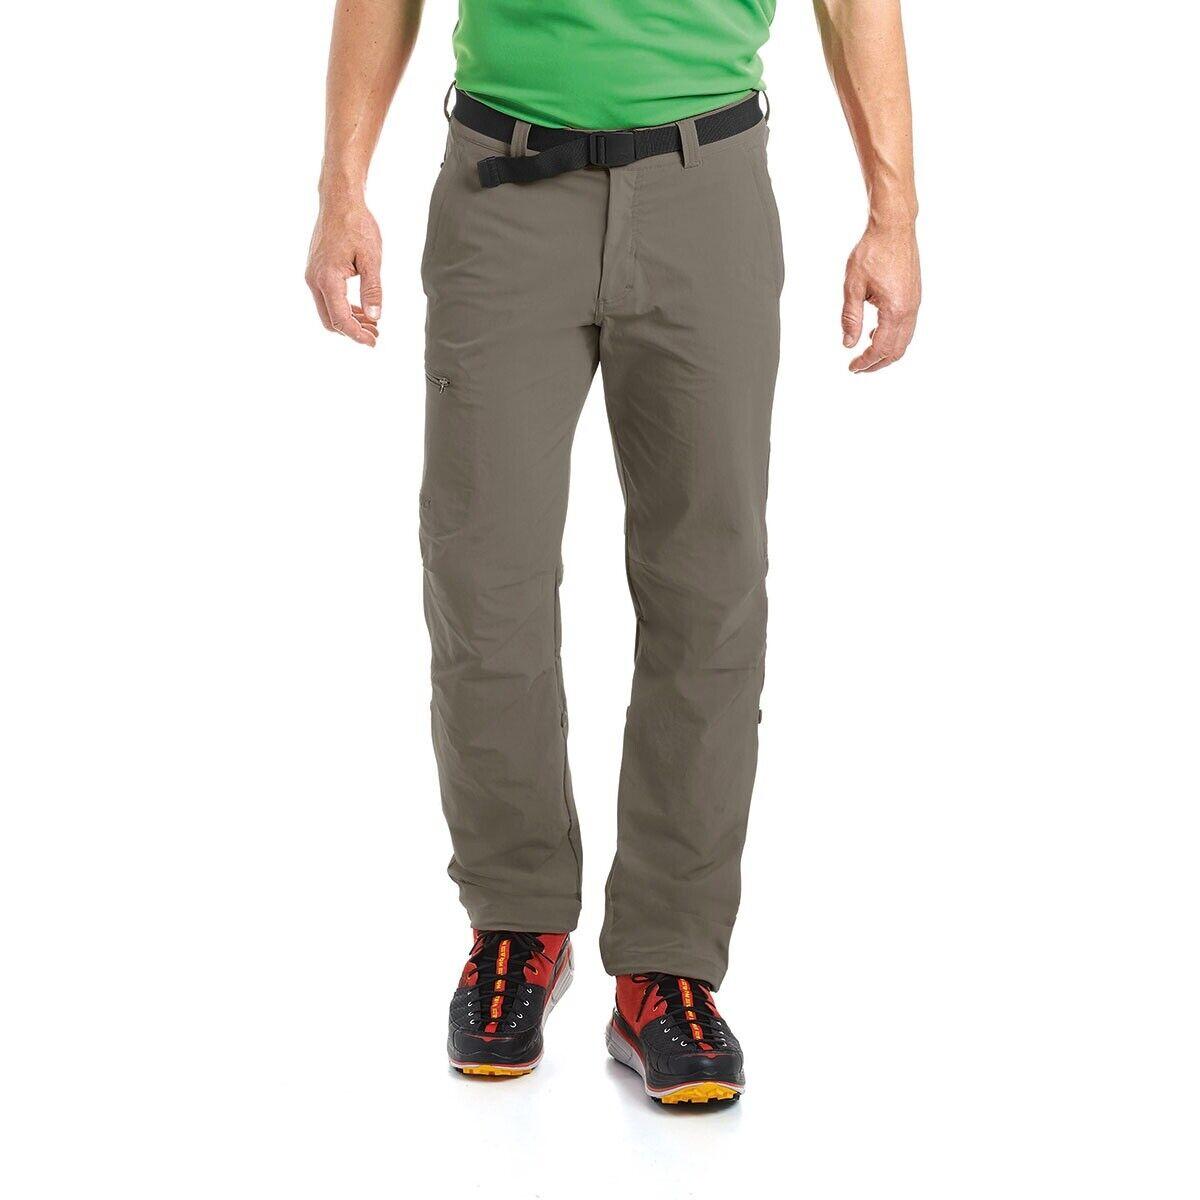 Maier Sports Nil rossoelle Up Pantaloni da Trekking Teak Canneto